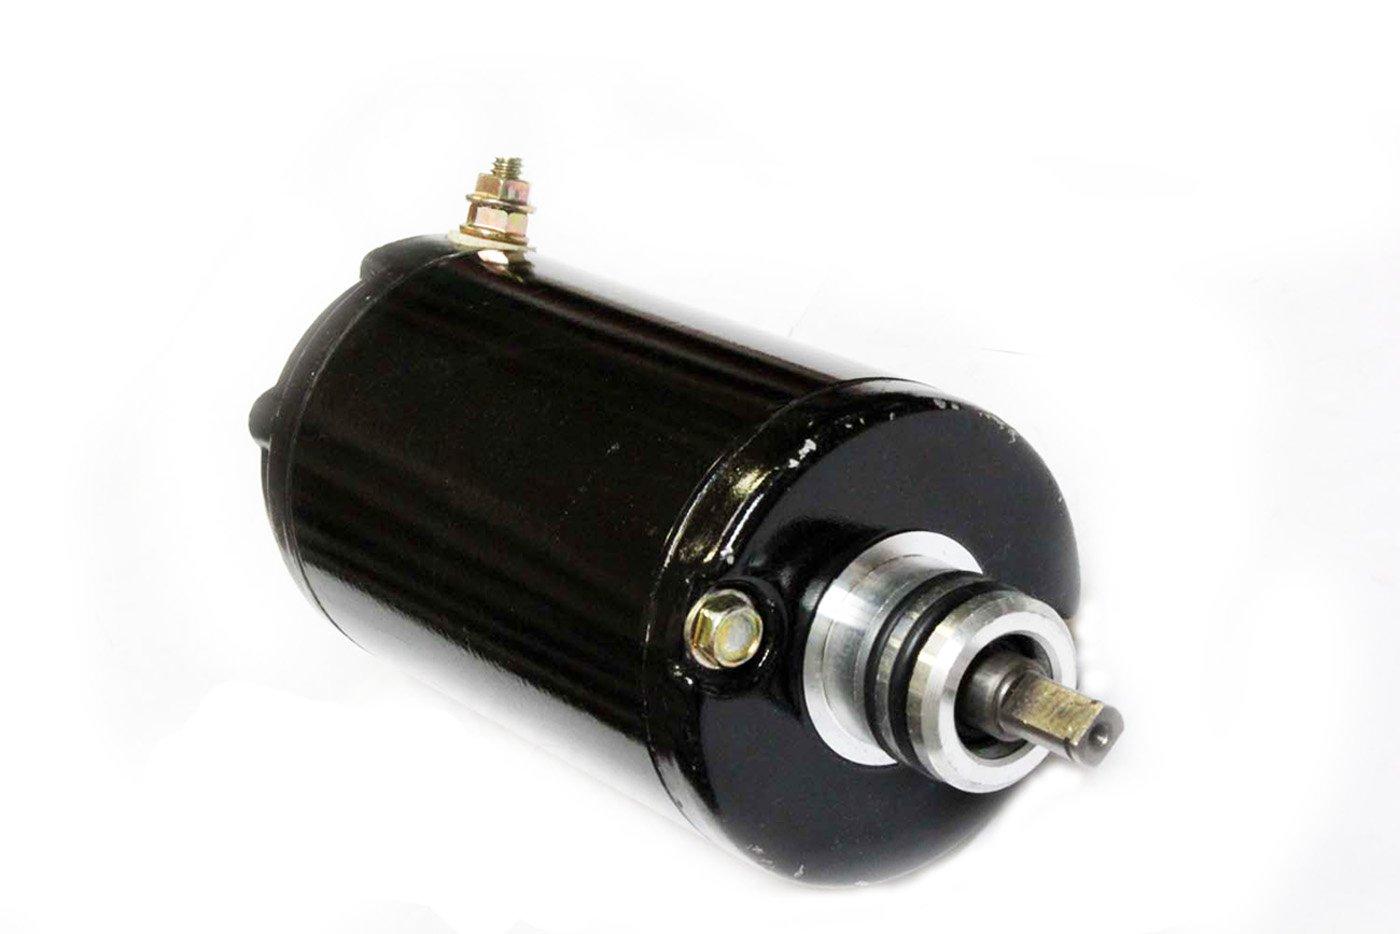 Shields 116-350-2000-1 Marine Fuel Fill Hose Per Foot 2 Inch Inside Diameter